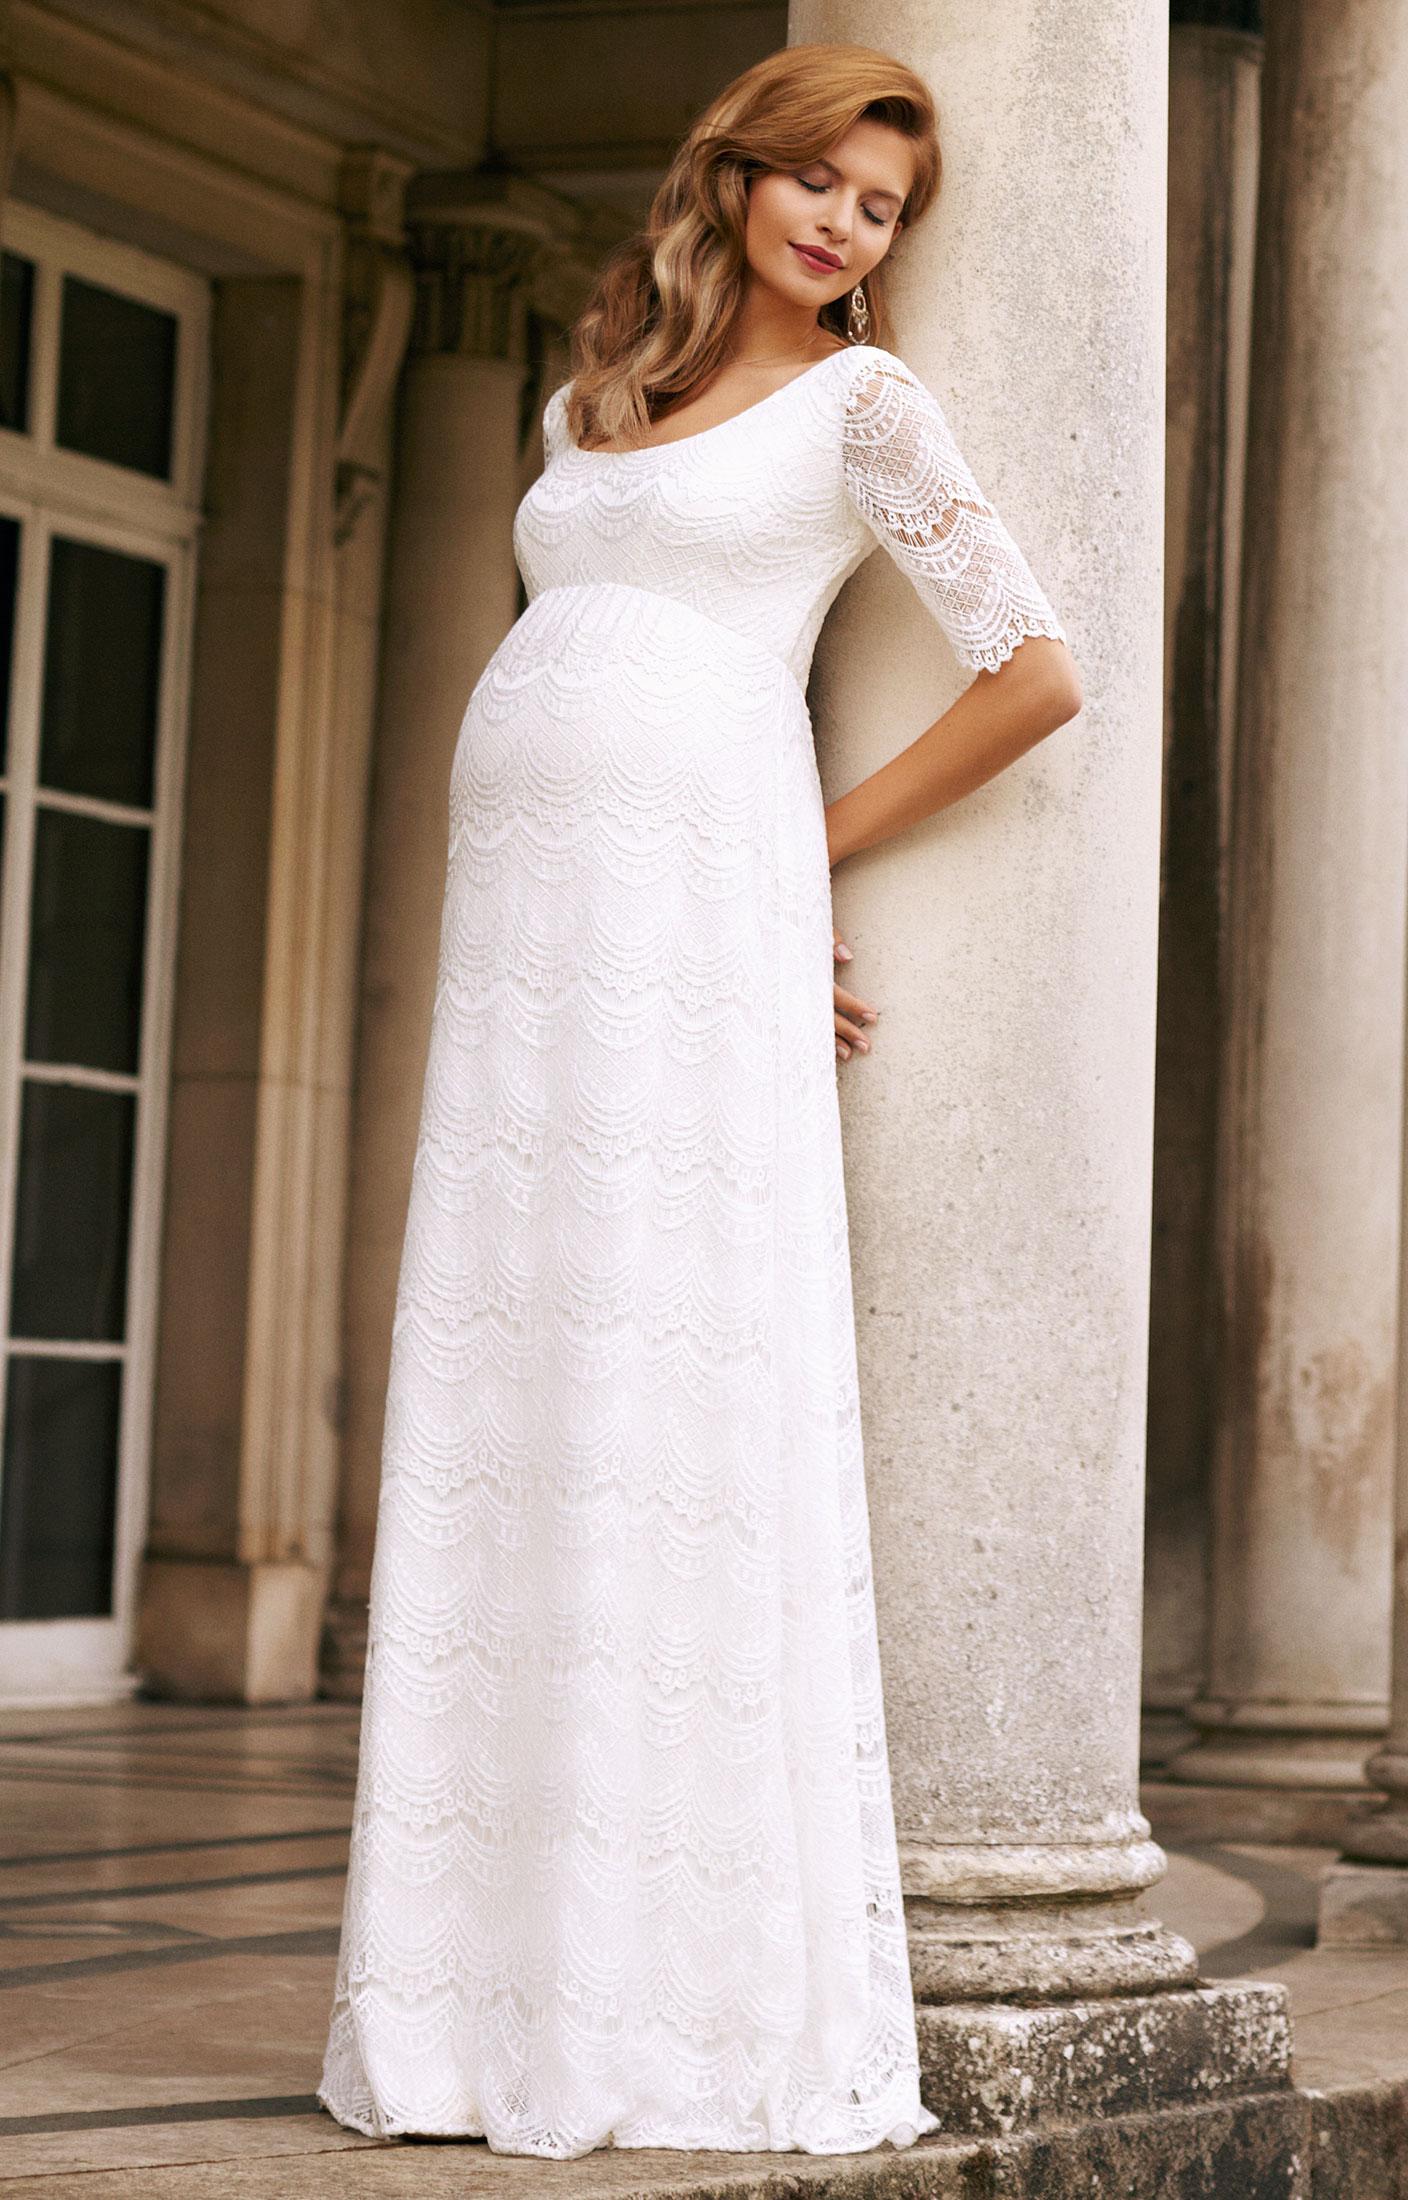 Verona Maternity Wedding Gown (Ivory) ivory wedding dresses Verona Maternity Wedding Gown Ivory by Tiffany Rose